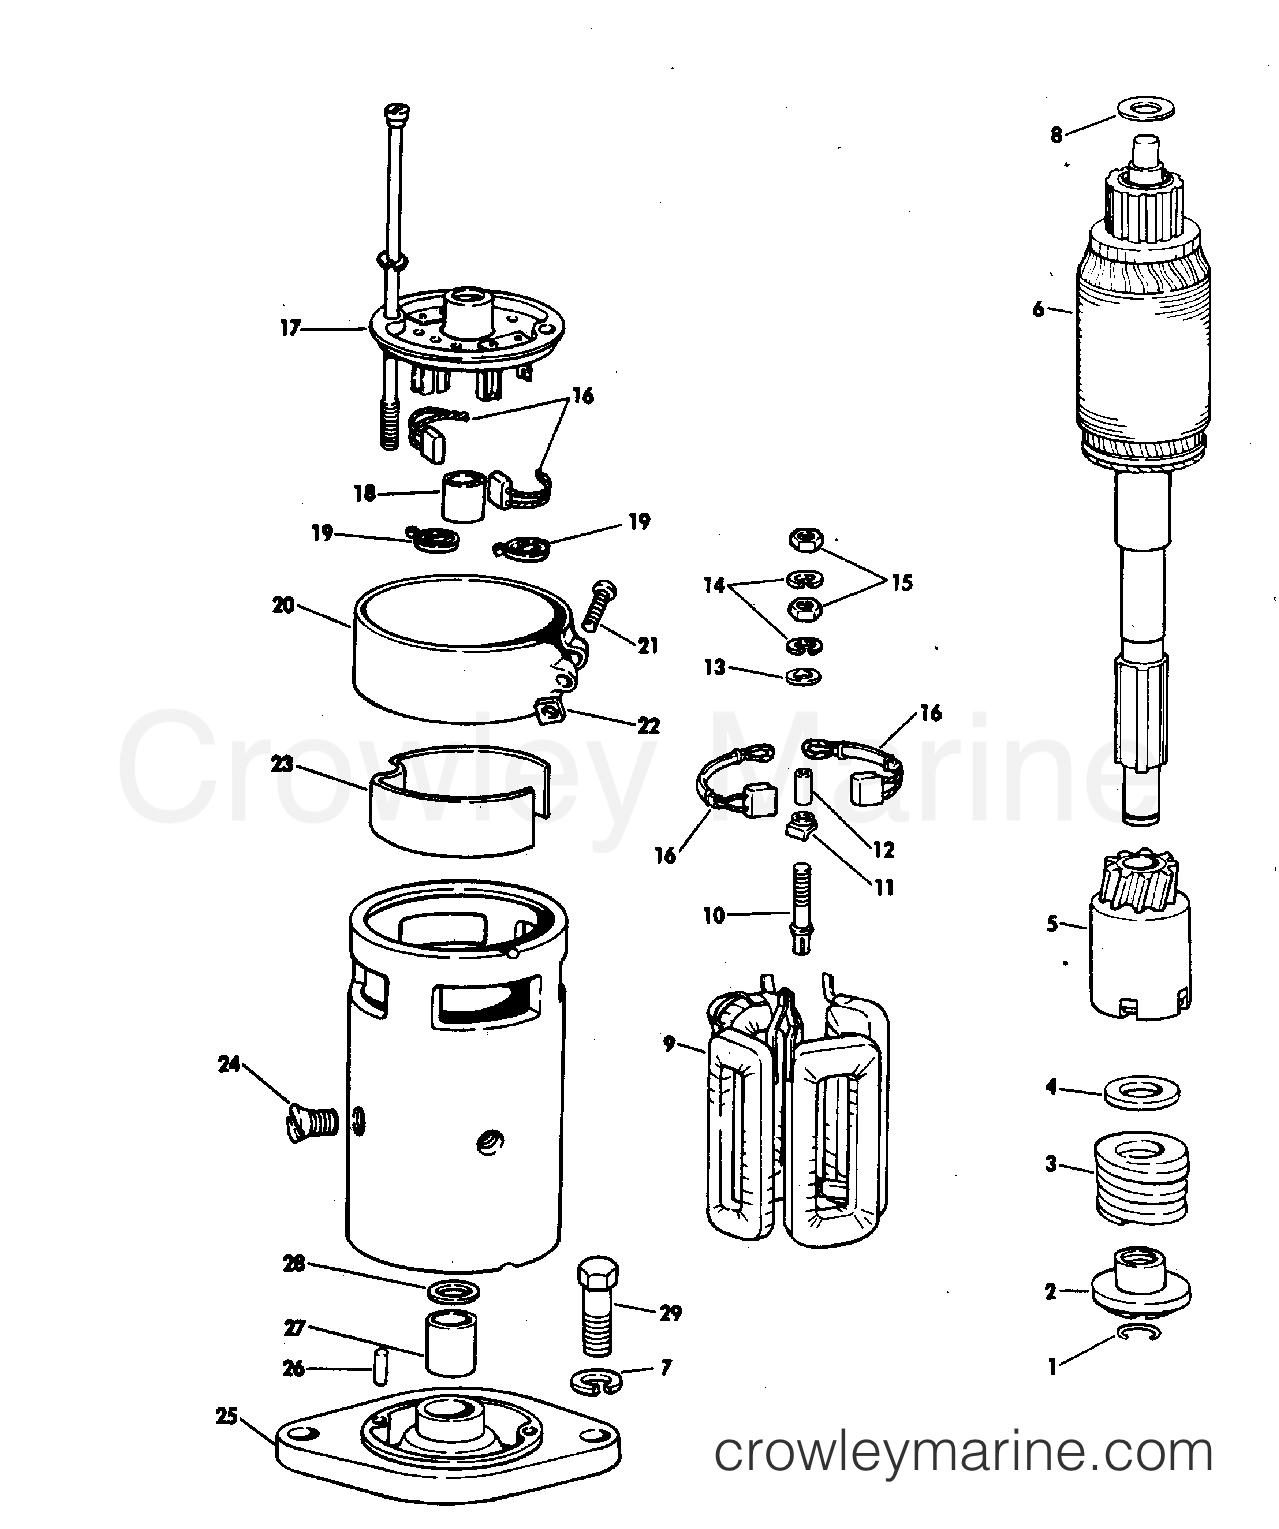 1969 OMC Stern Drive 80 - NUE-10S - STARTER MOTOR GROUP 80 HP